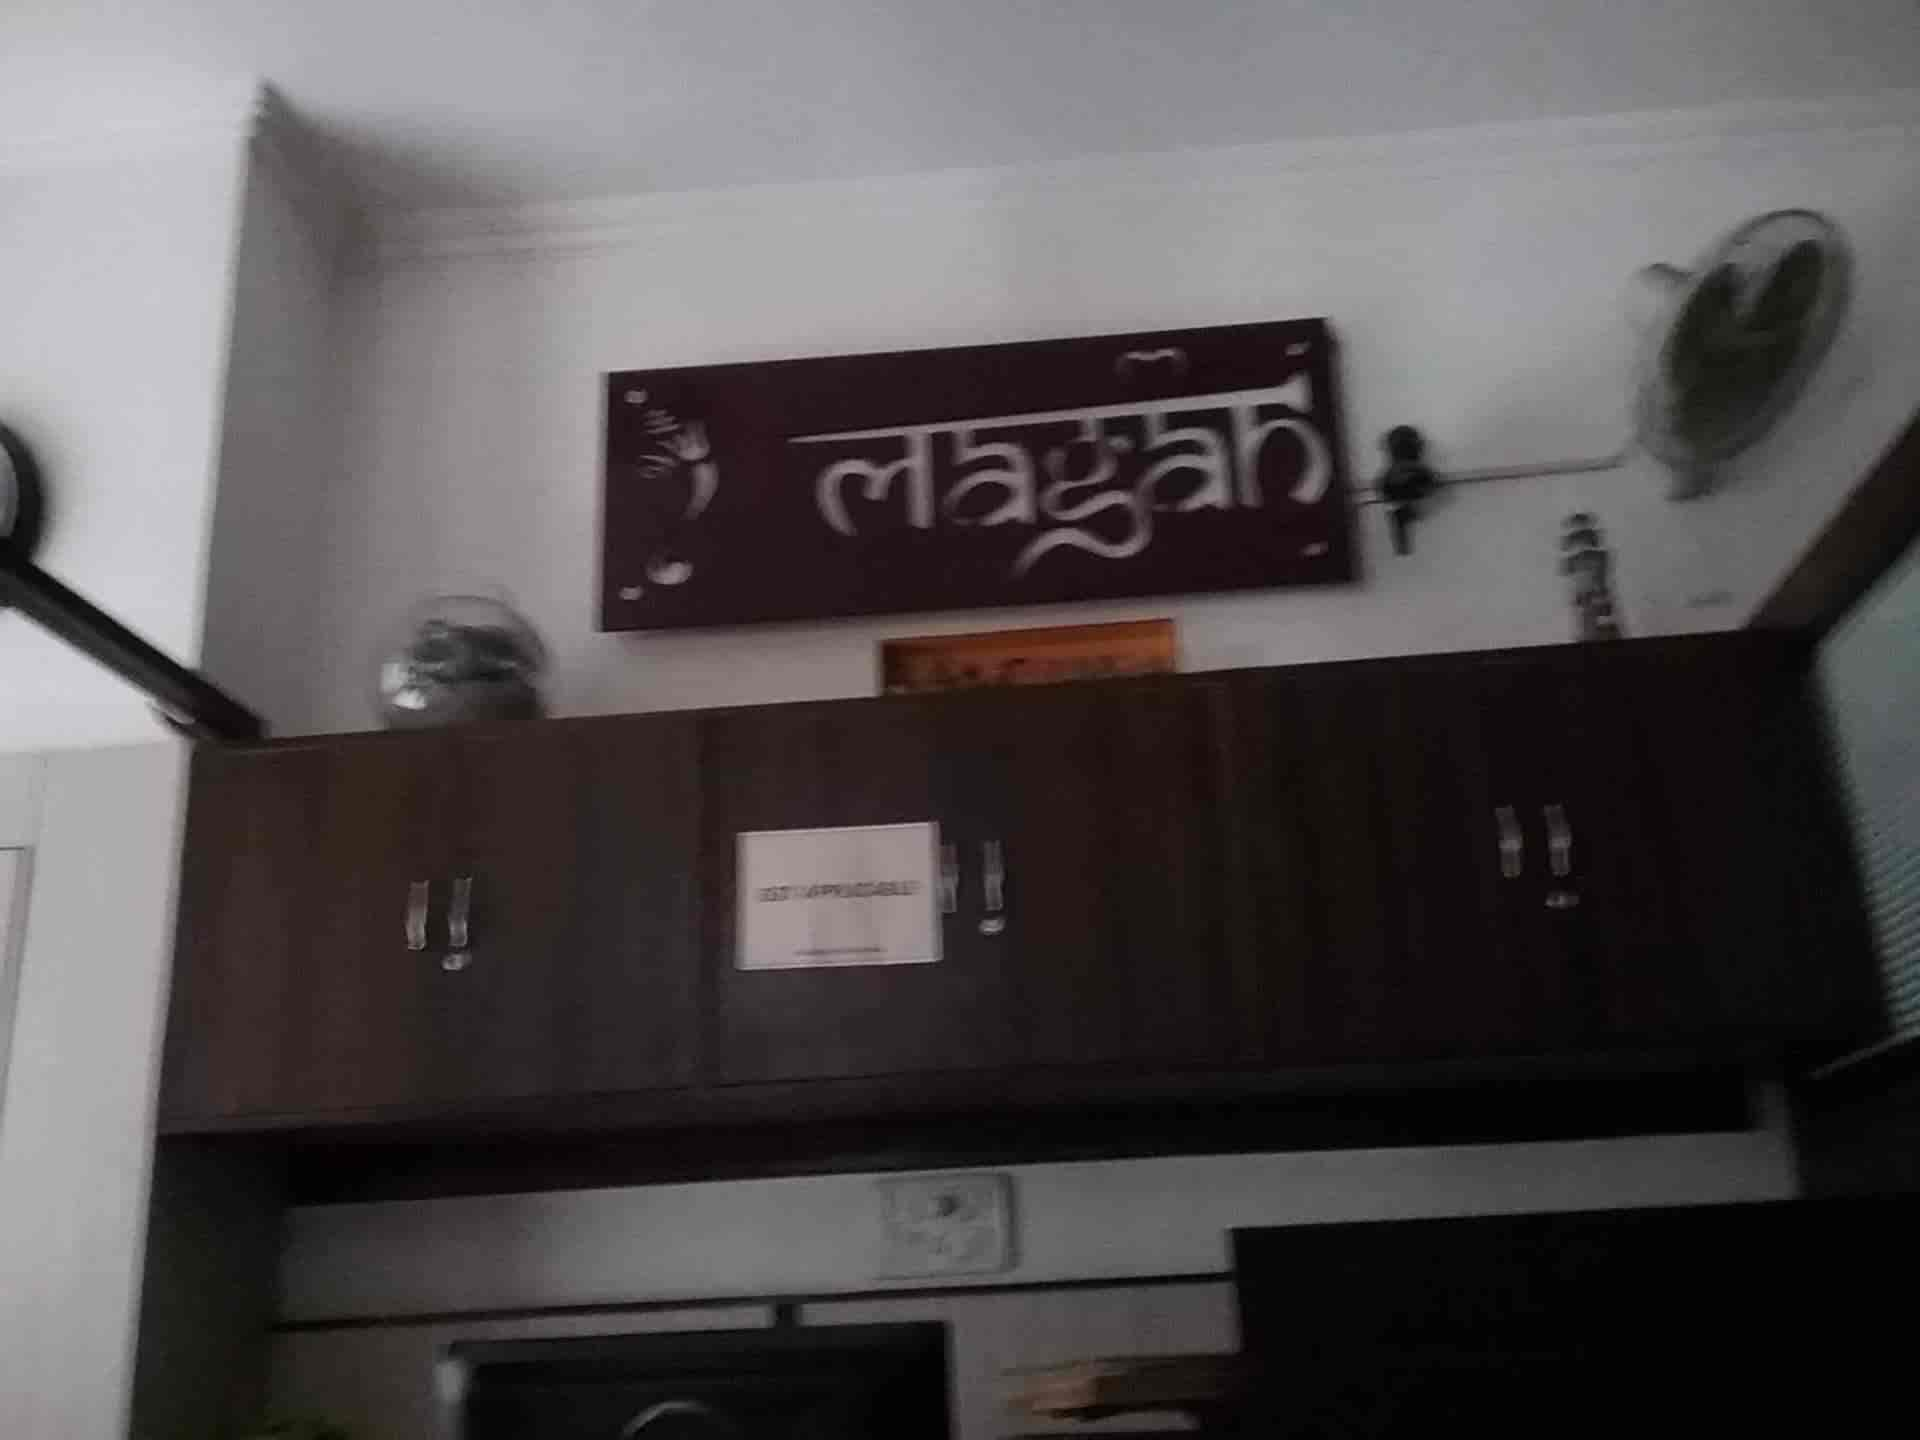 Lagan, Sector 26 - Matrimonial Bureaus For Hindu in